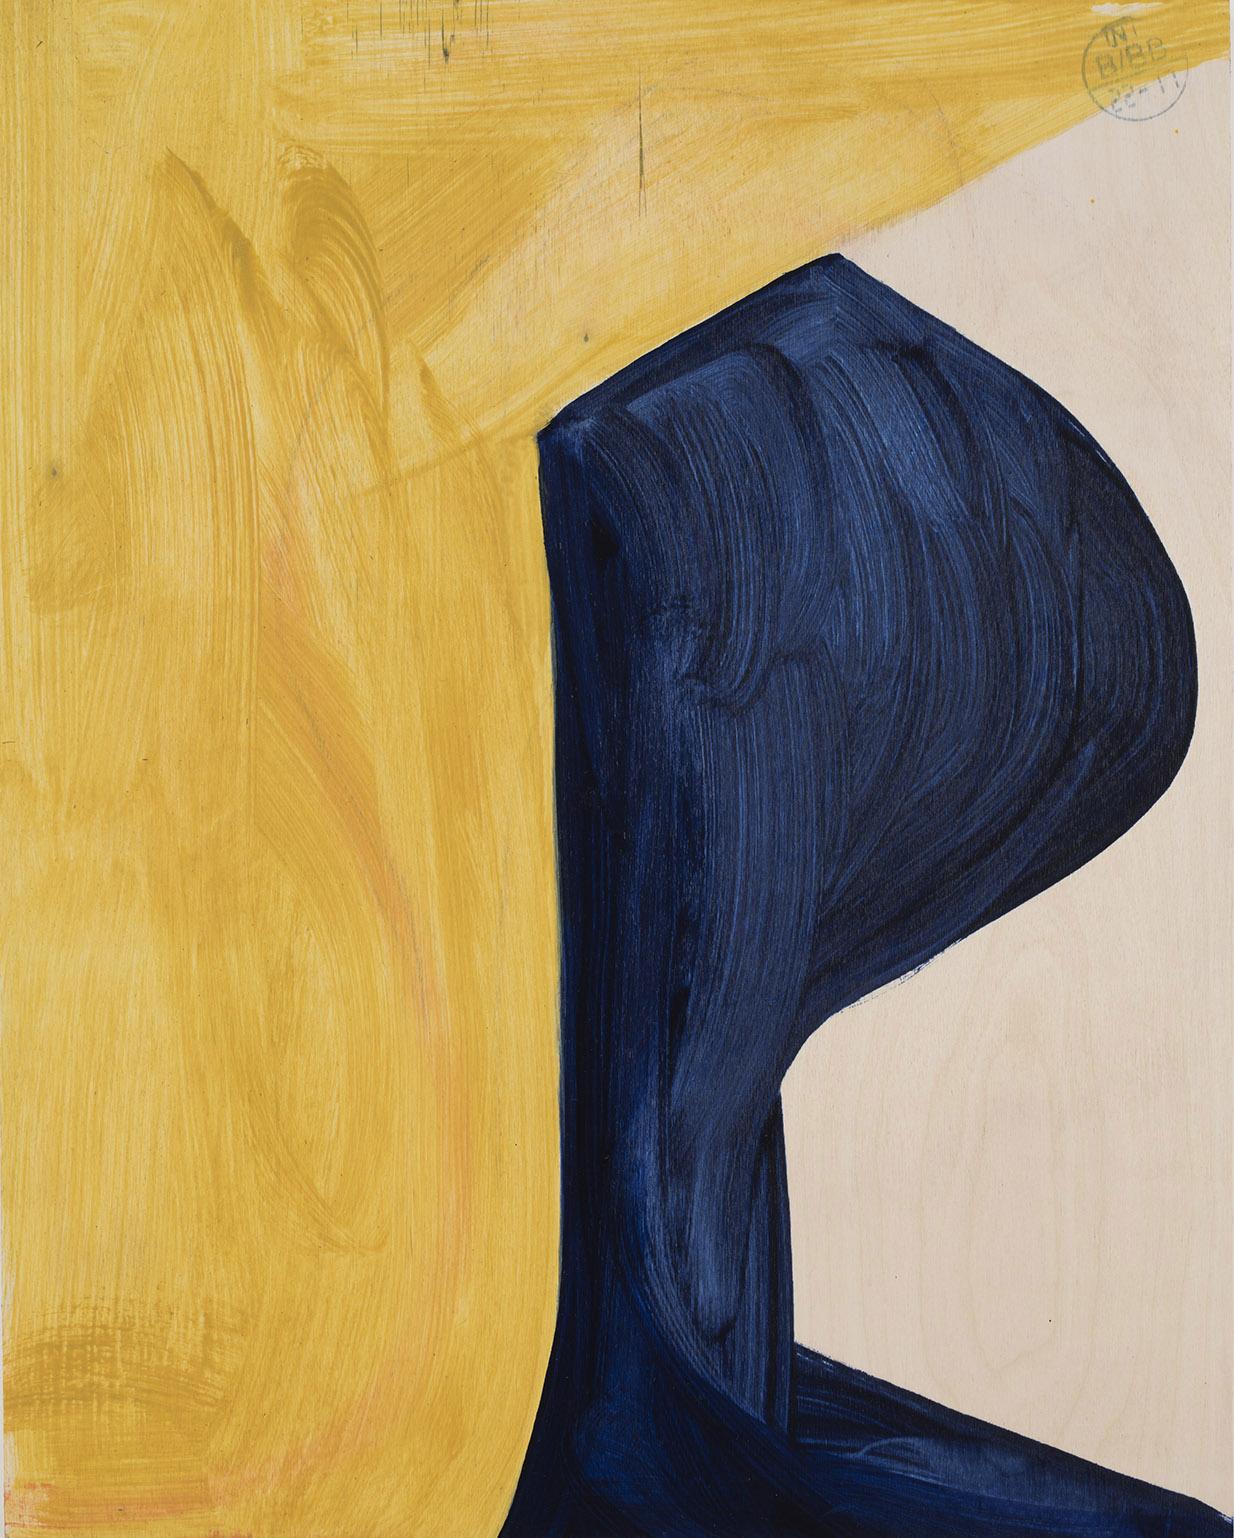 Andrea Belag, Mirror, 2016, oil on wood, 20h x 16w in.